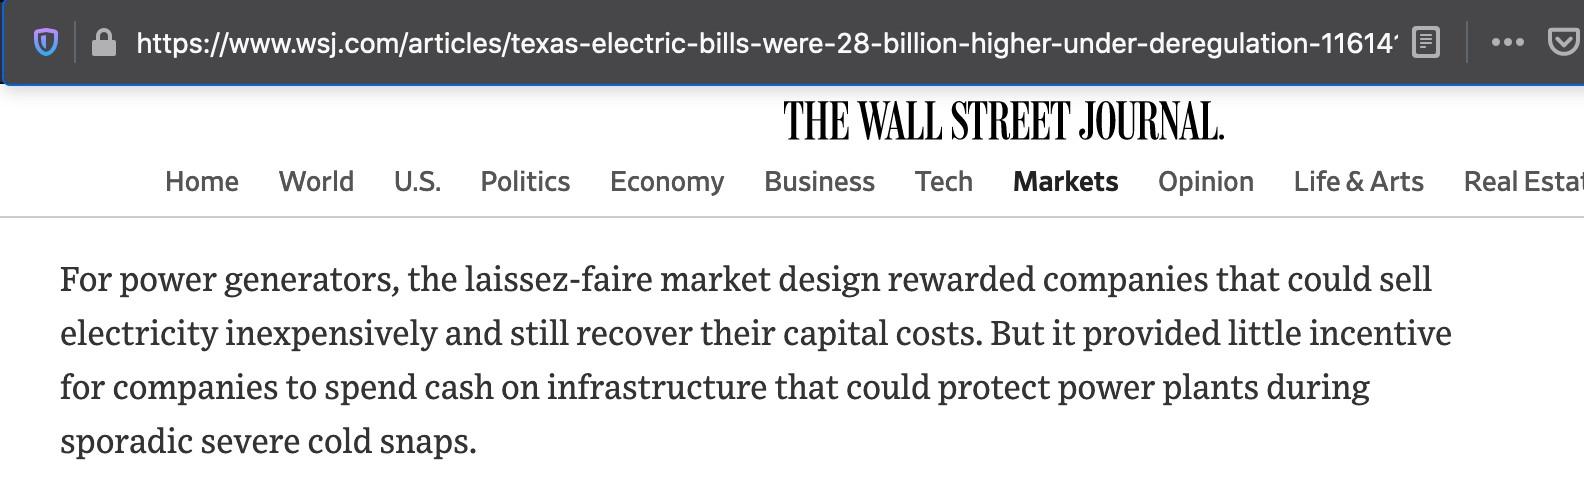 https://www.wsj.com/articles/texas-electric-bills-were-28-billion-higher-under-deregulation-11614162780?mod=hp_lead_pos5